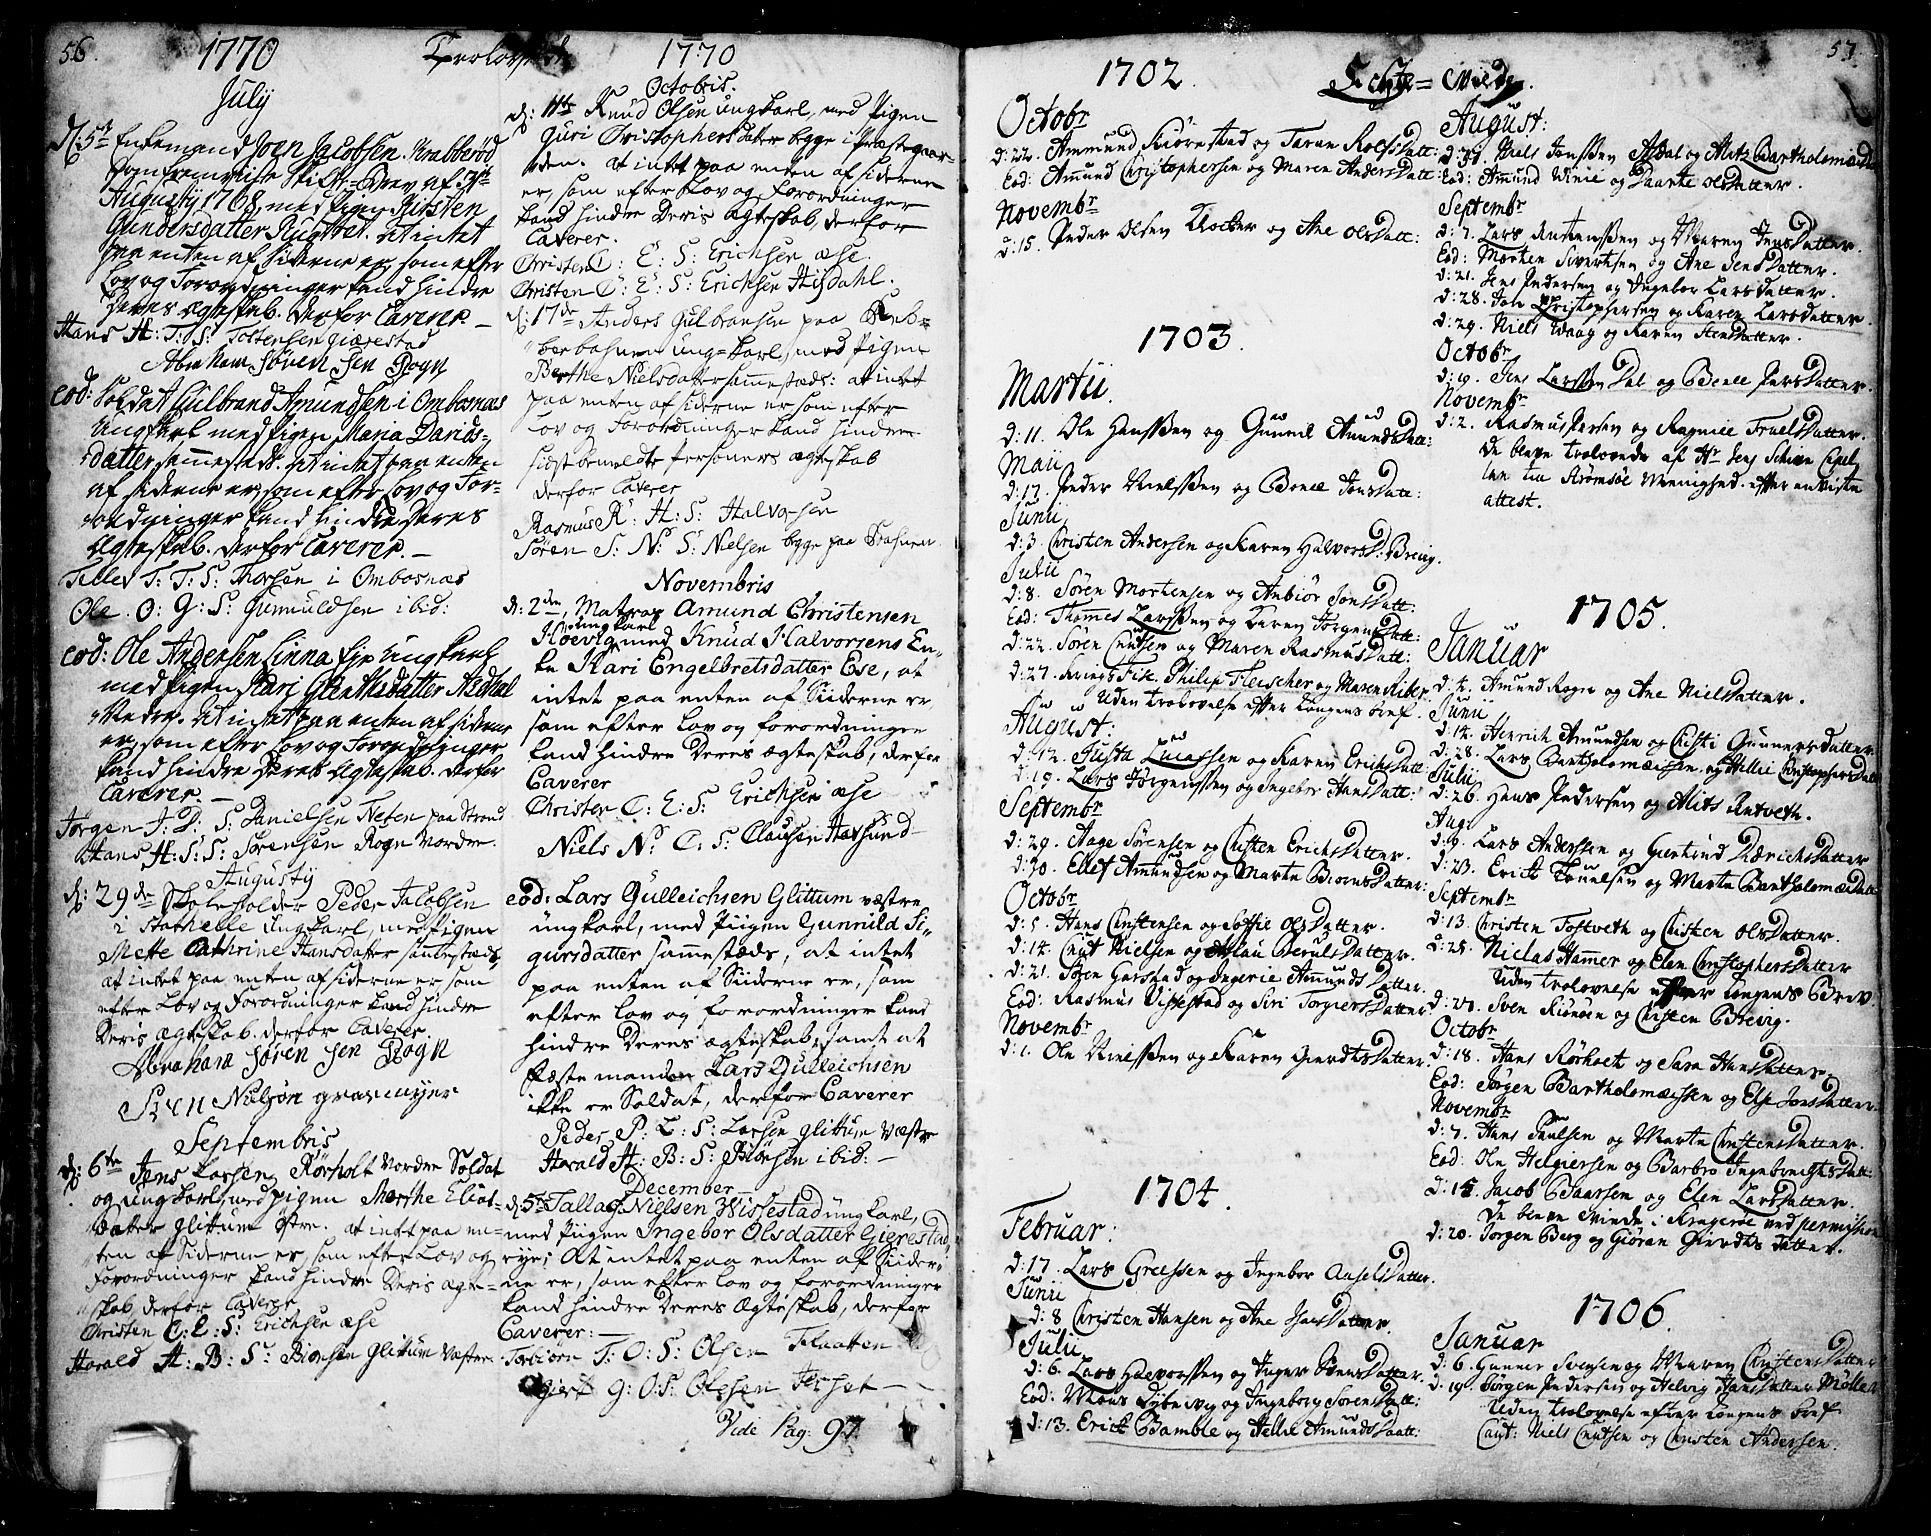 SAKO, Bamble kirkebøker, F/Fa/L0001: Ministerialbok nr. I 1, 1702-1774, s. 56-57